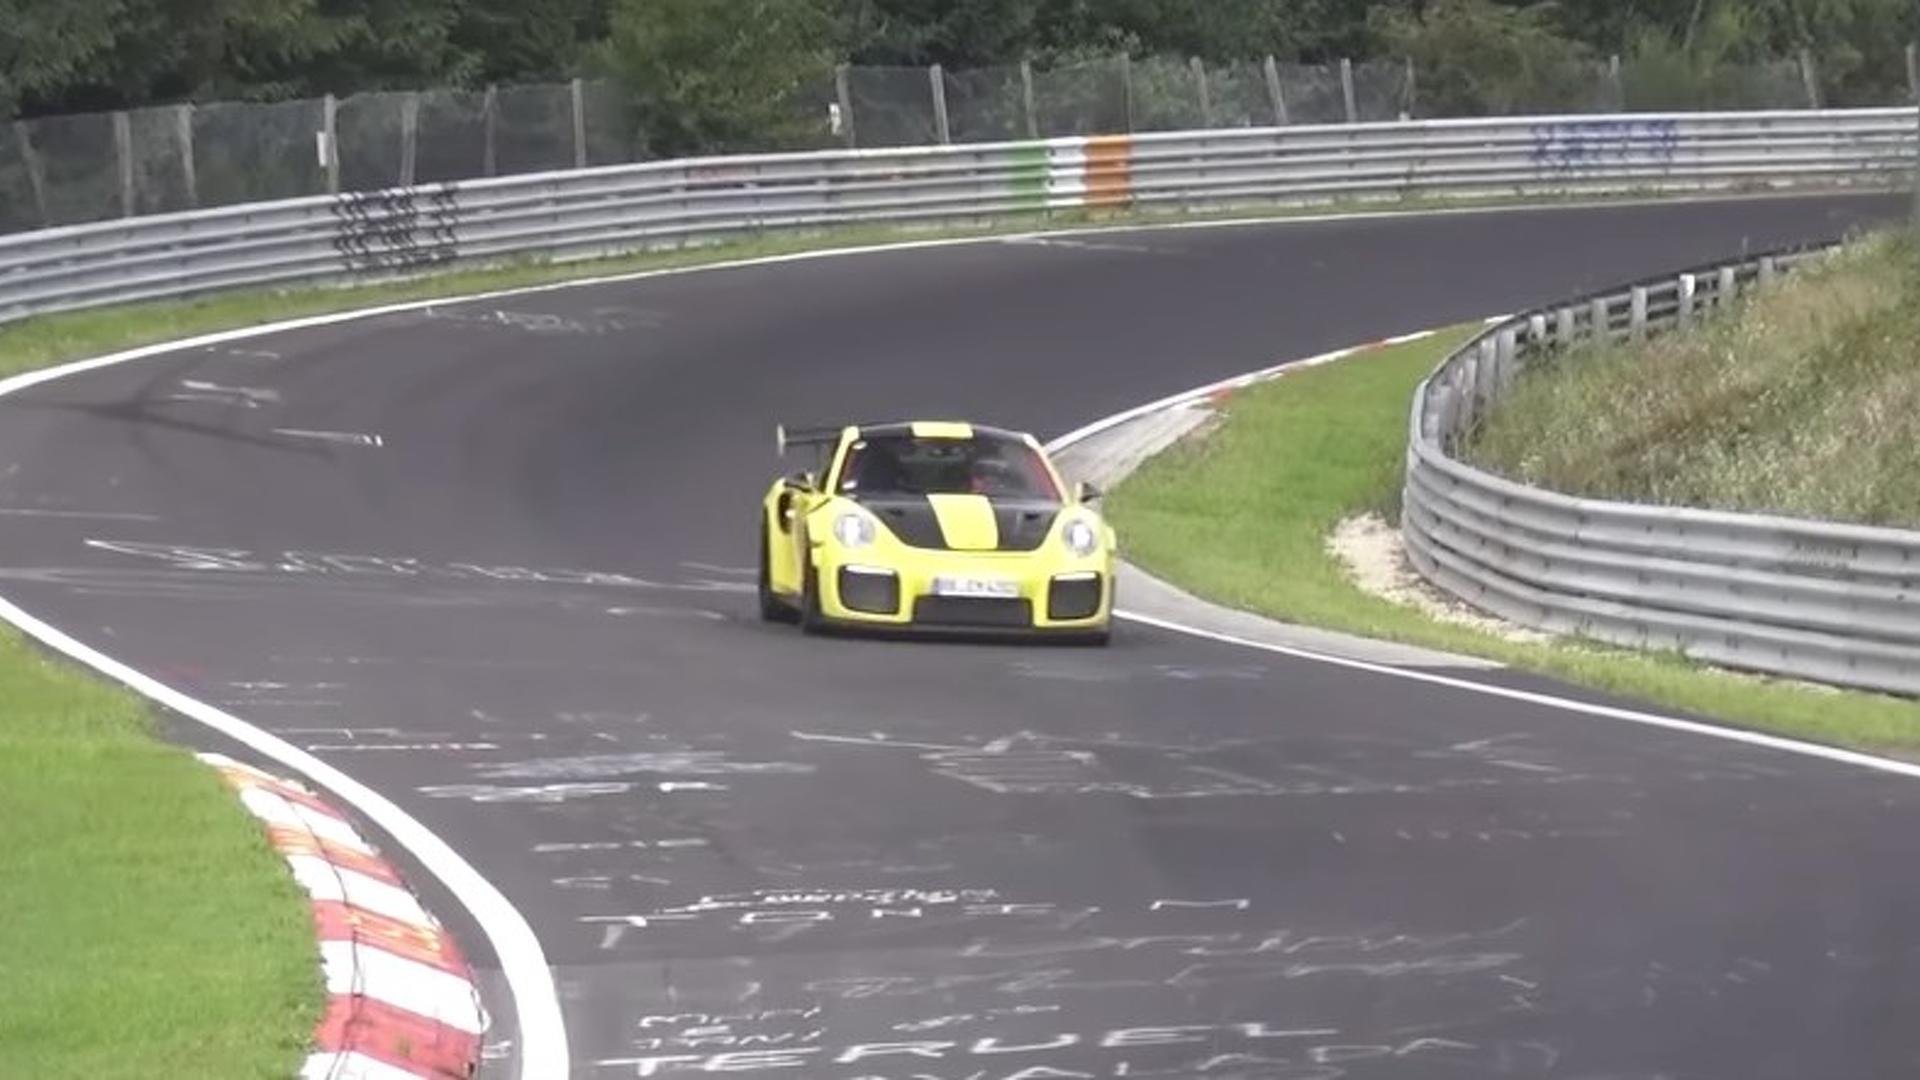 porsche-911-gt2-rs-nurburgring Interesting Porsche 911 Gt2 Rs Nurburgring Lap Cars Trend